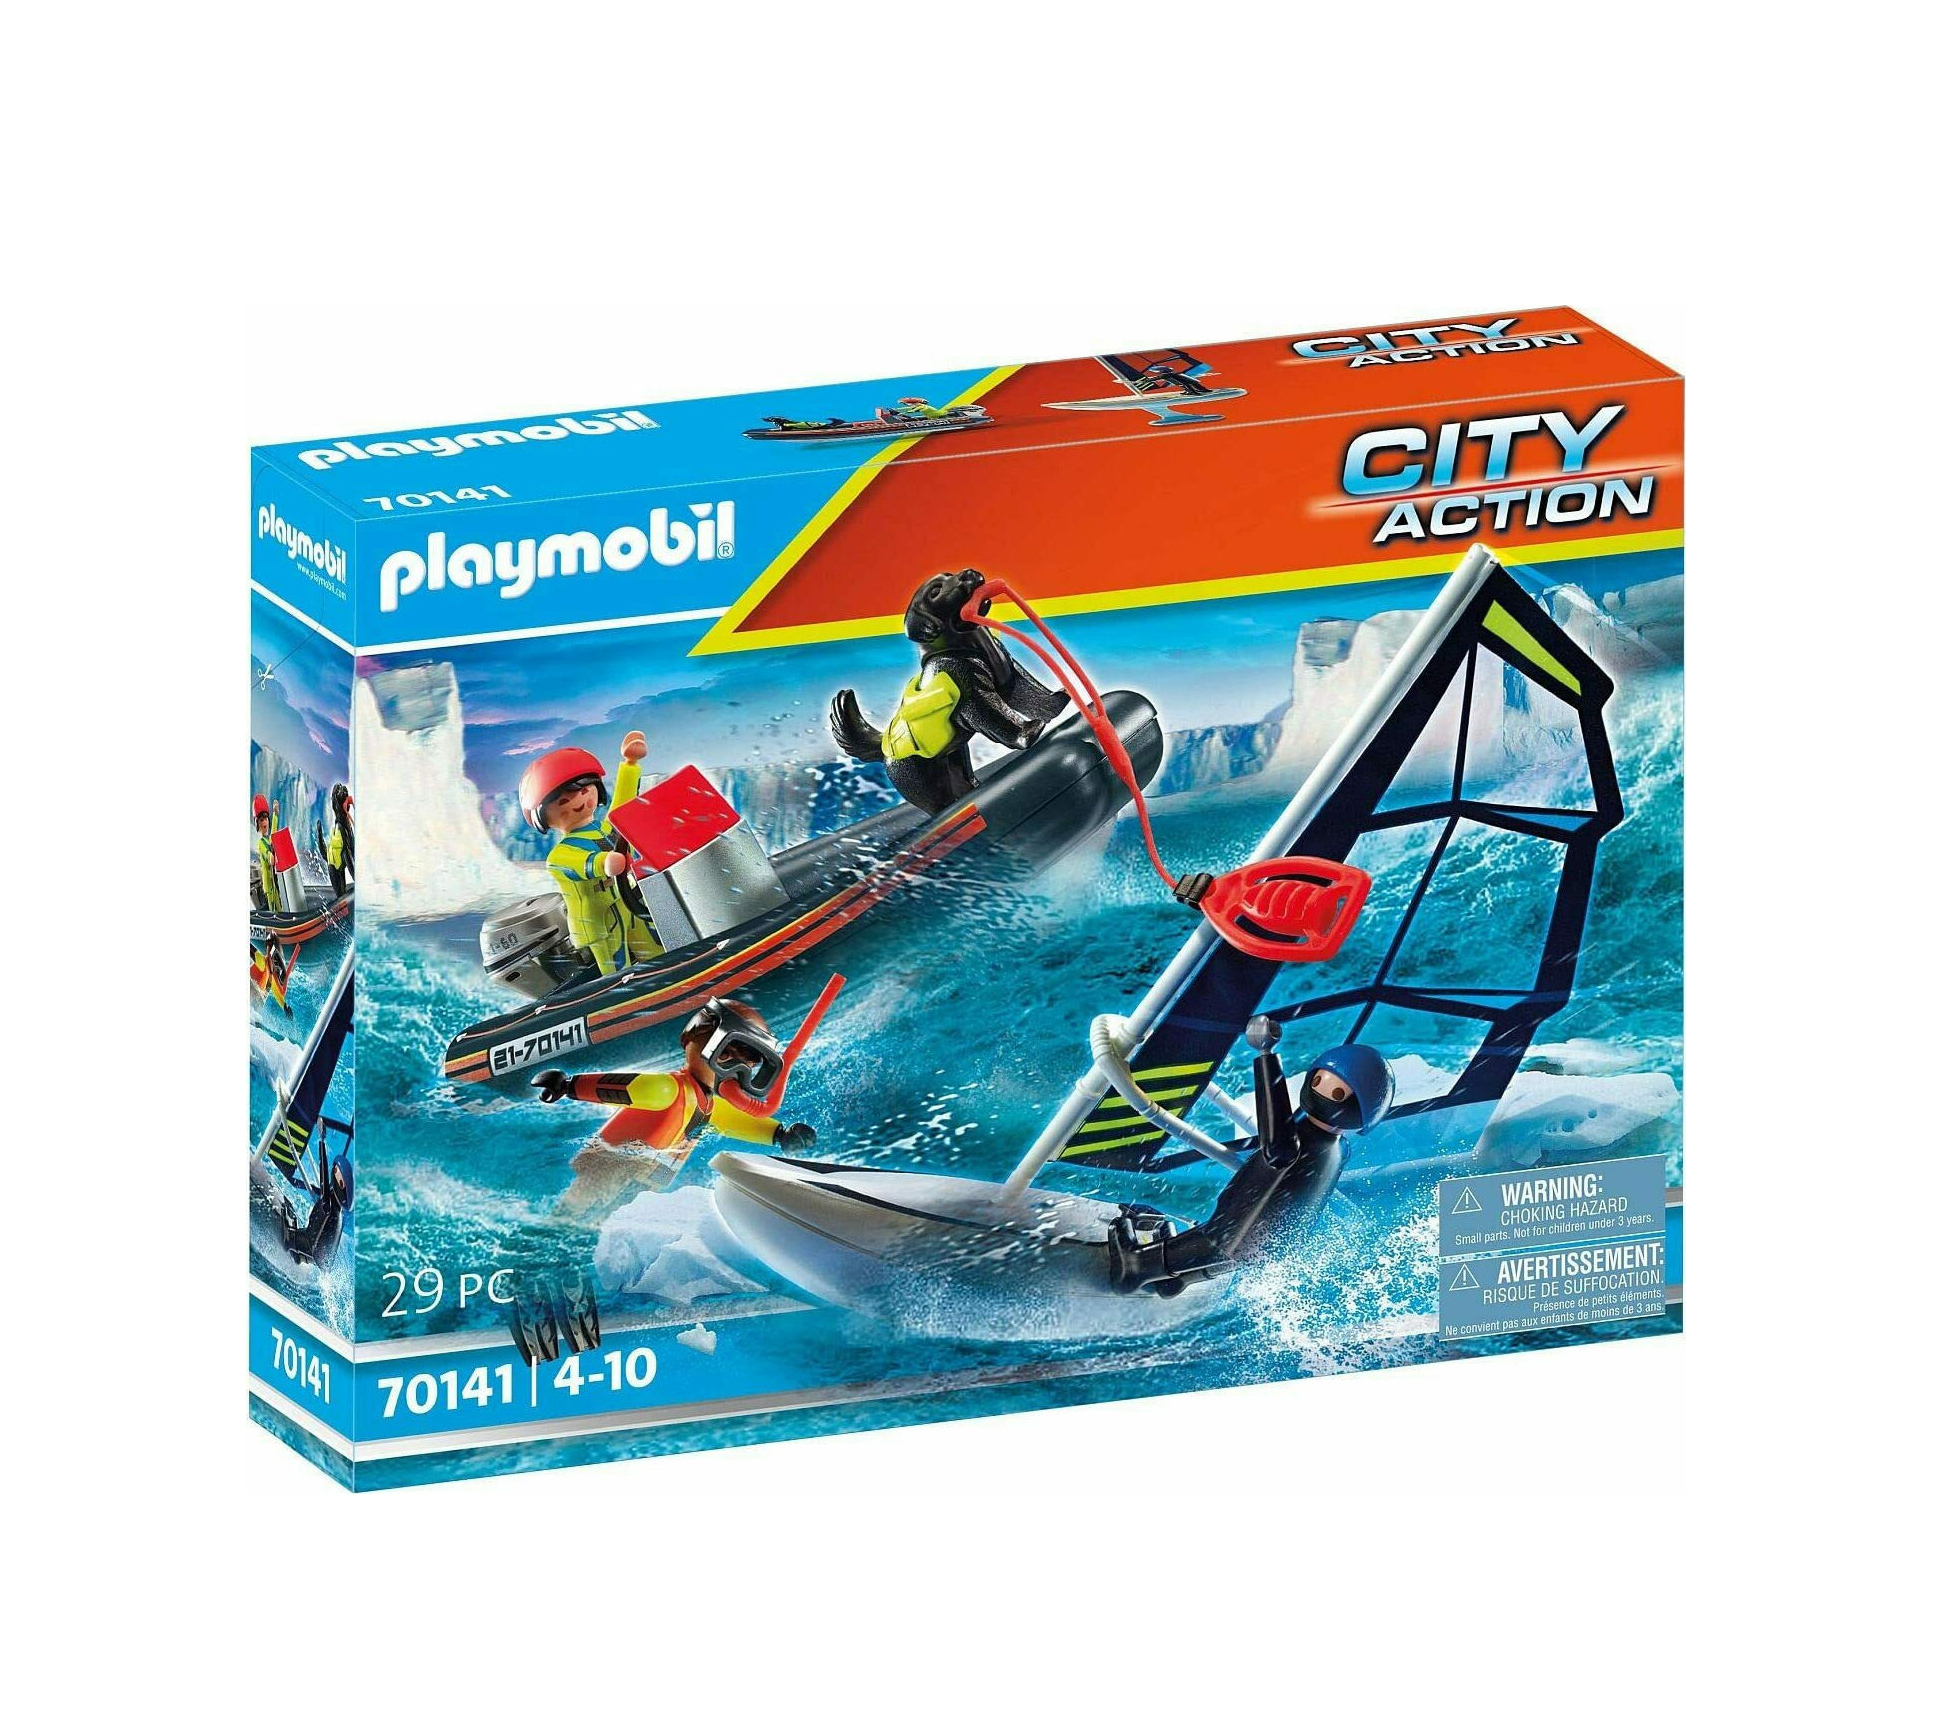 Playmobil City Action: Polar Sailor Rescue With Dinghy 70141